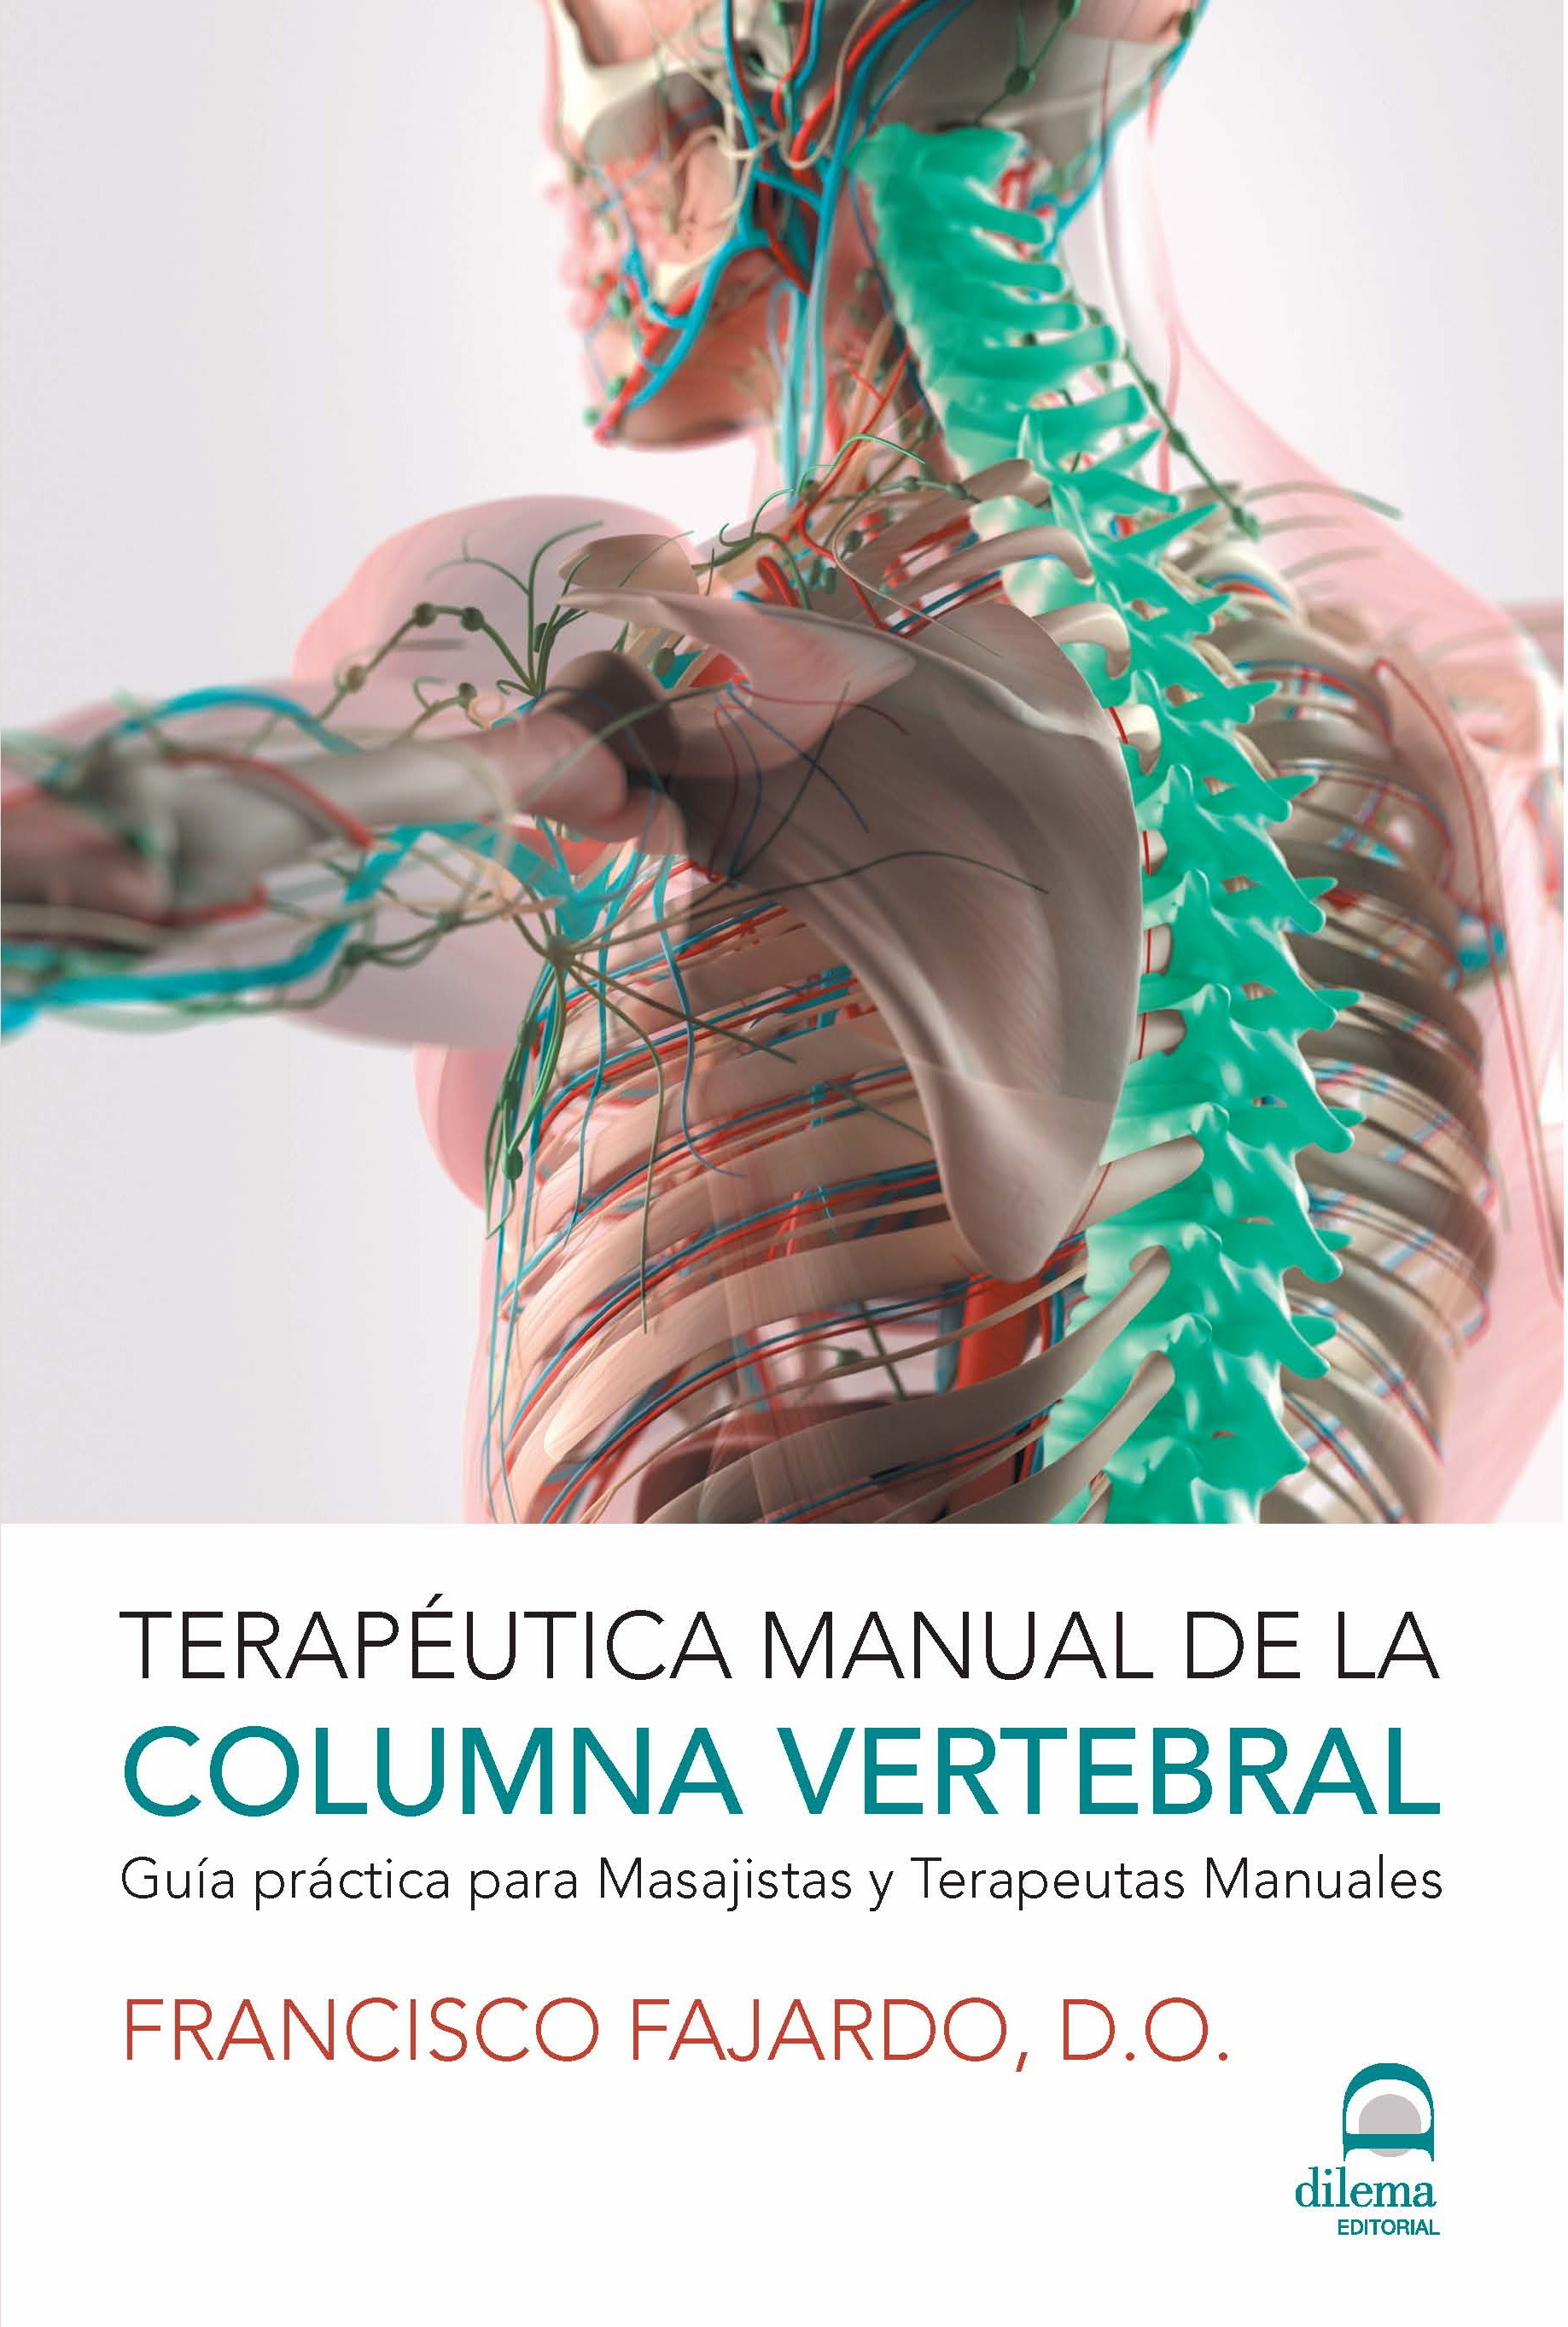 Terapéutica manual de la Columna Vertebral Image